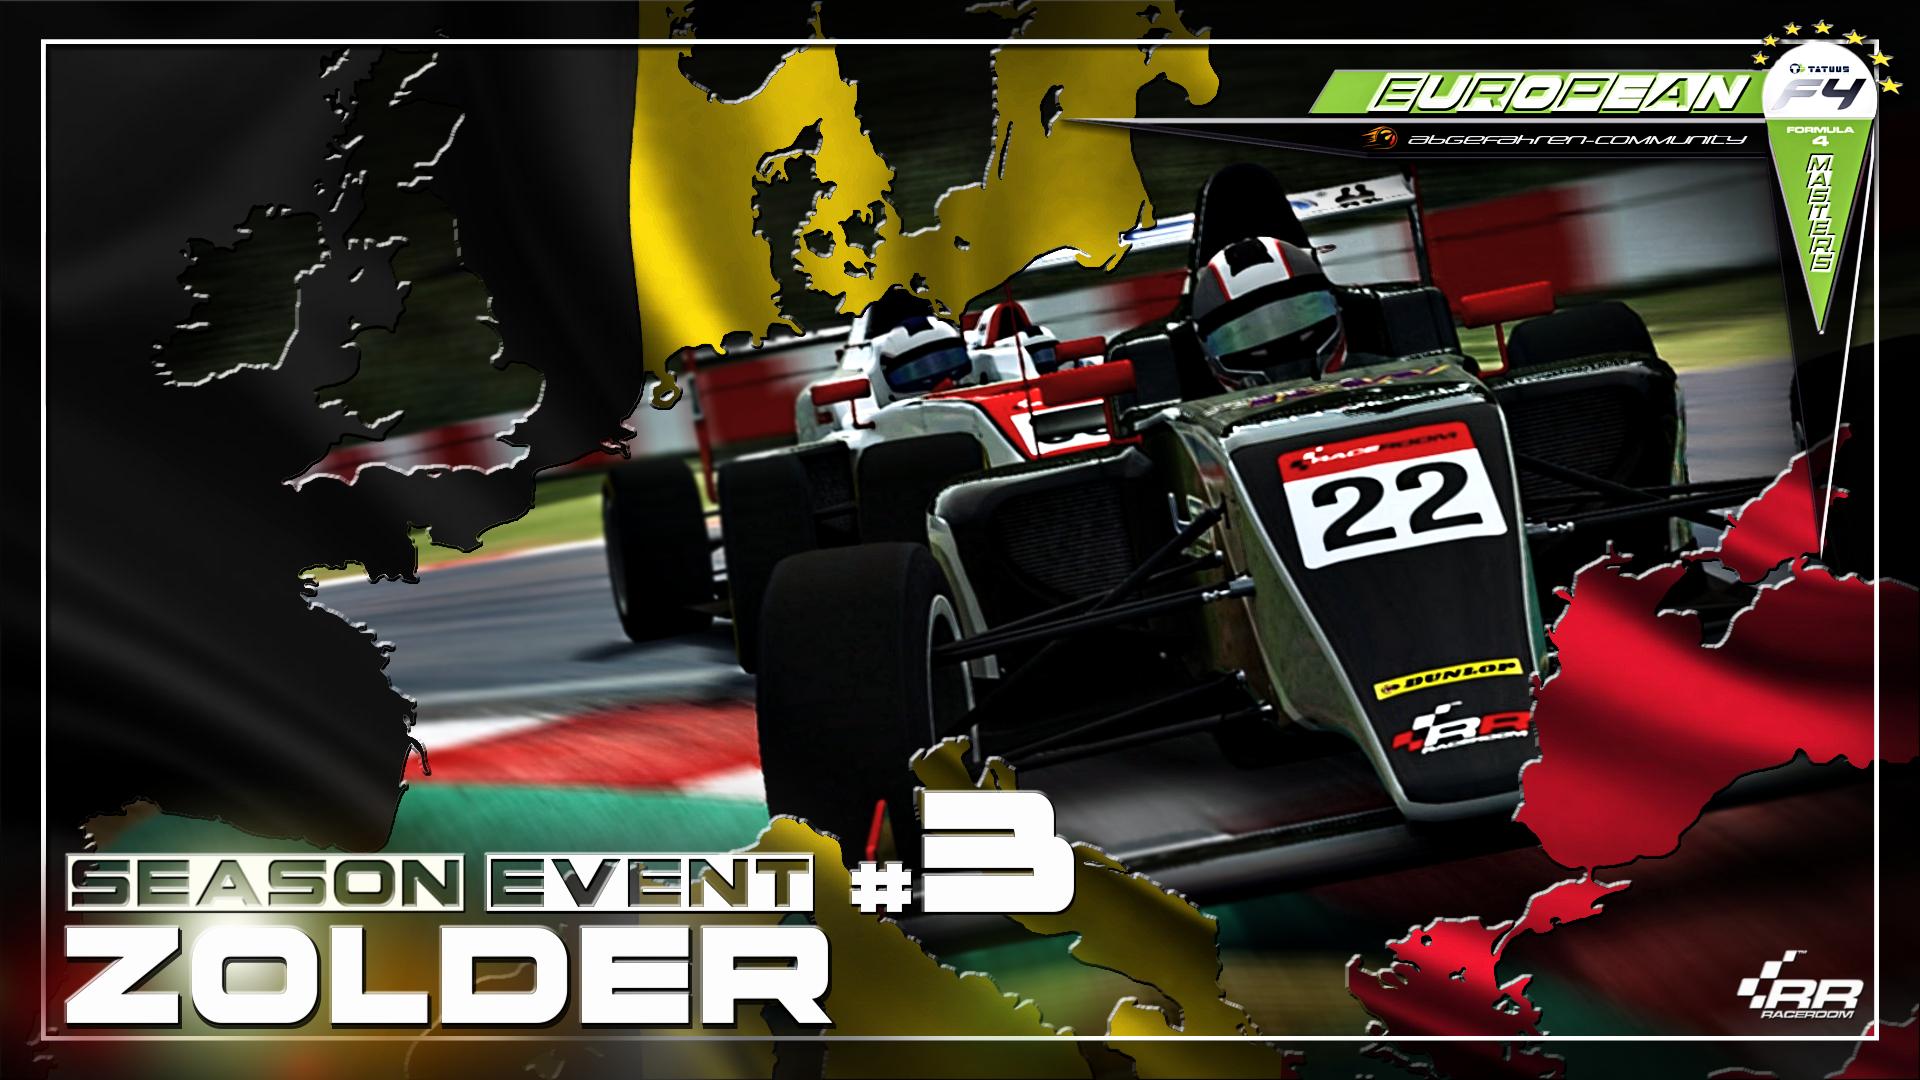 European Formula 4 Masters [EF4M] Season Event #3 | Zolder